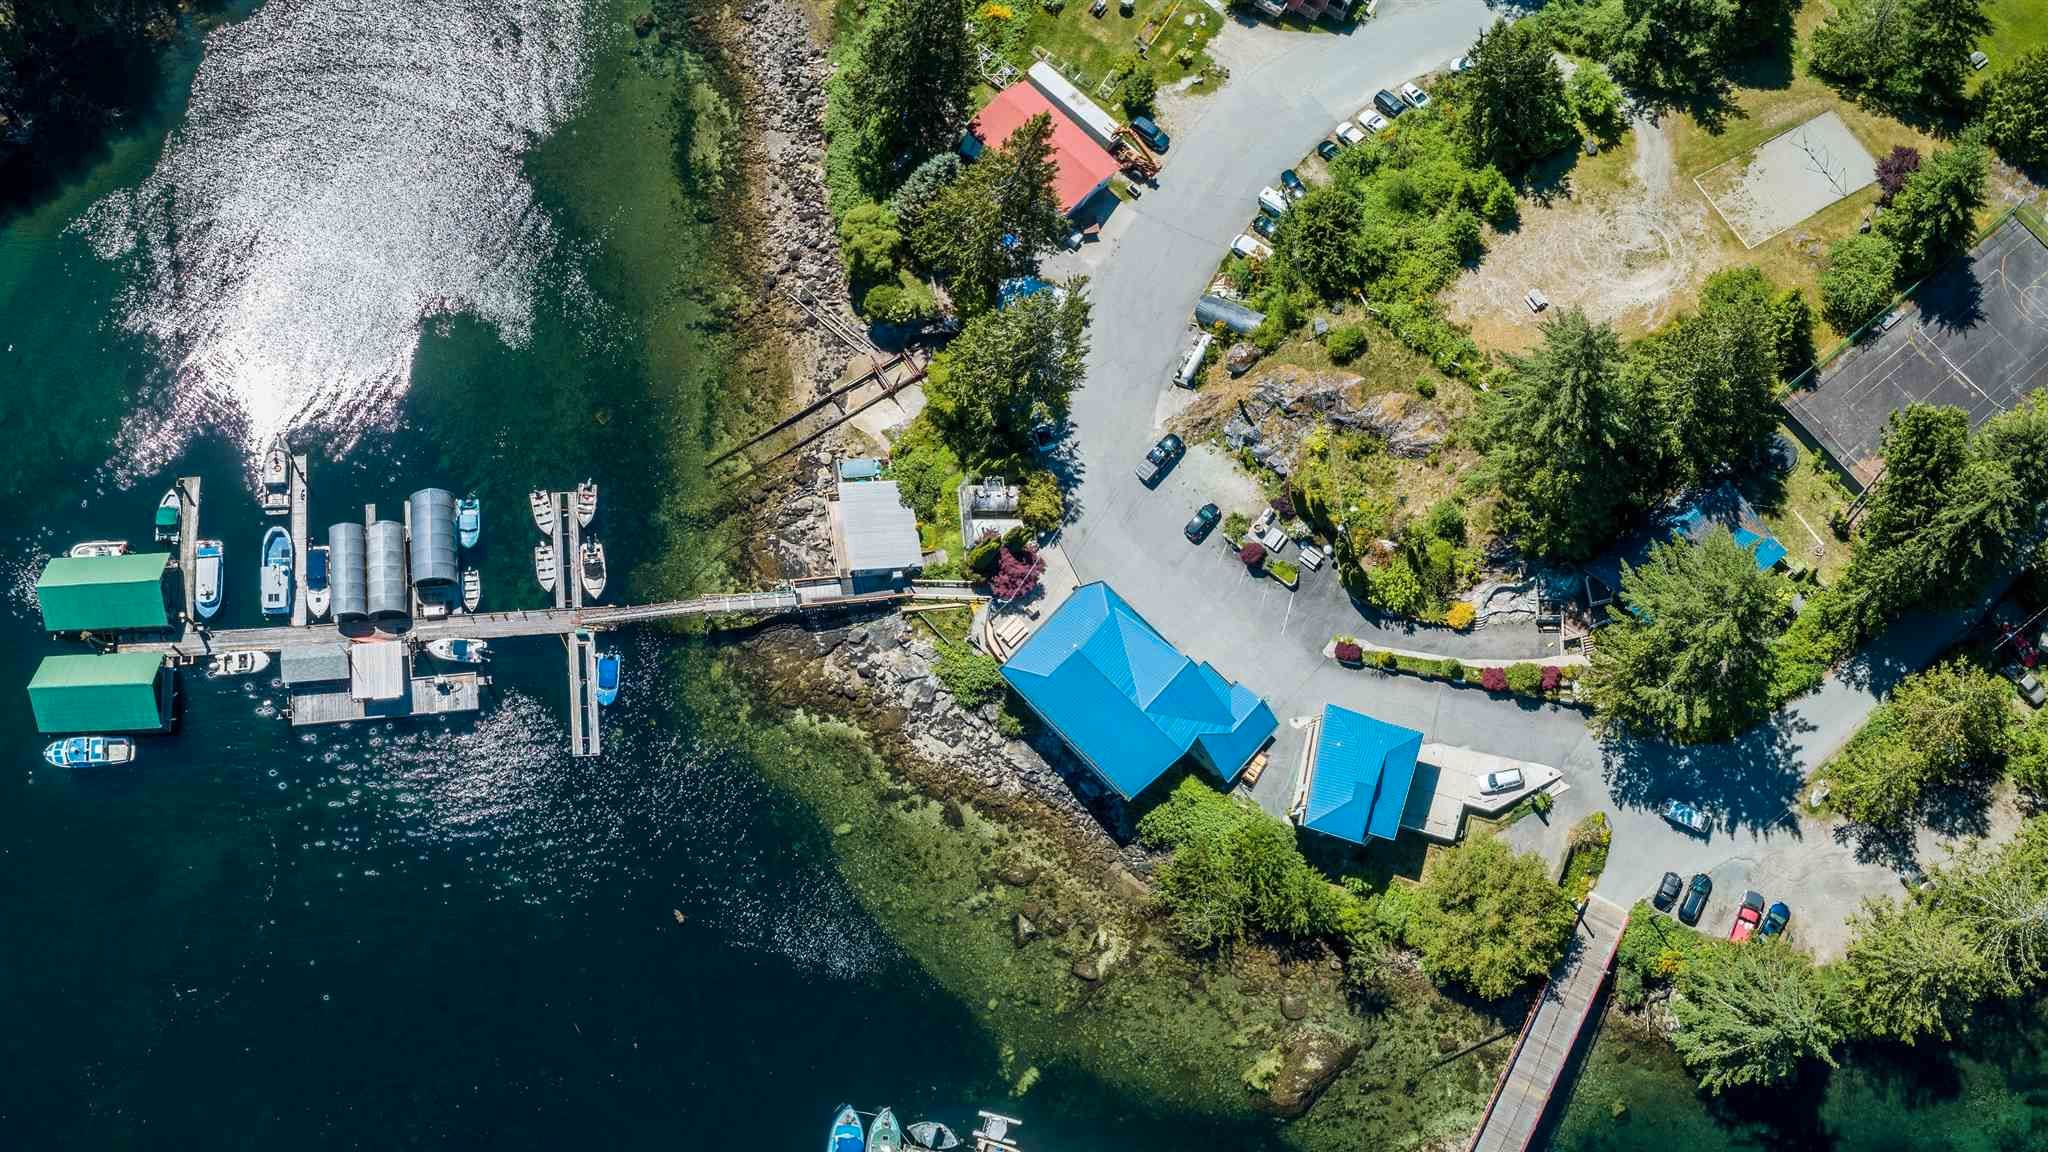 Photo 4: Photos: 6781 BATHGATE Road in Egmont: Pender Harbour Egmont House for sale (Sunshine Coast)  : MLS®# R2593981